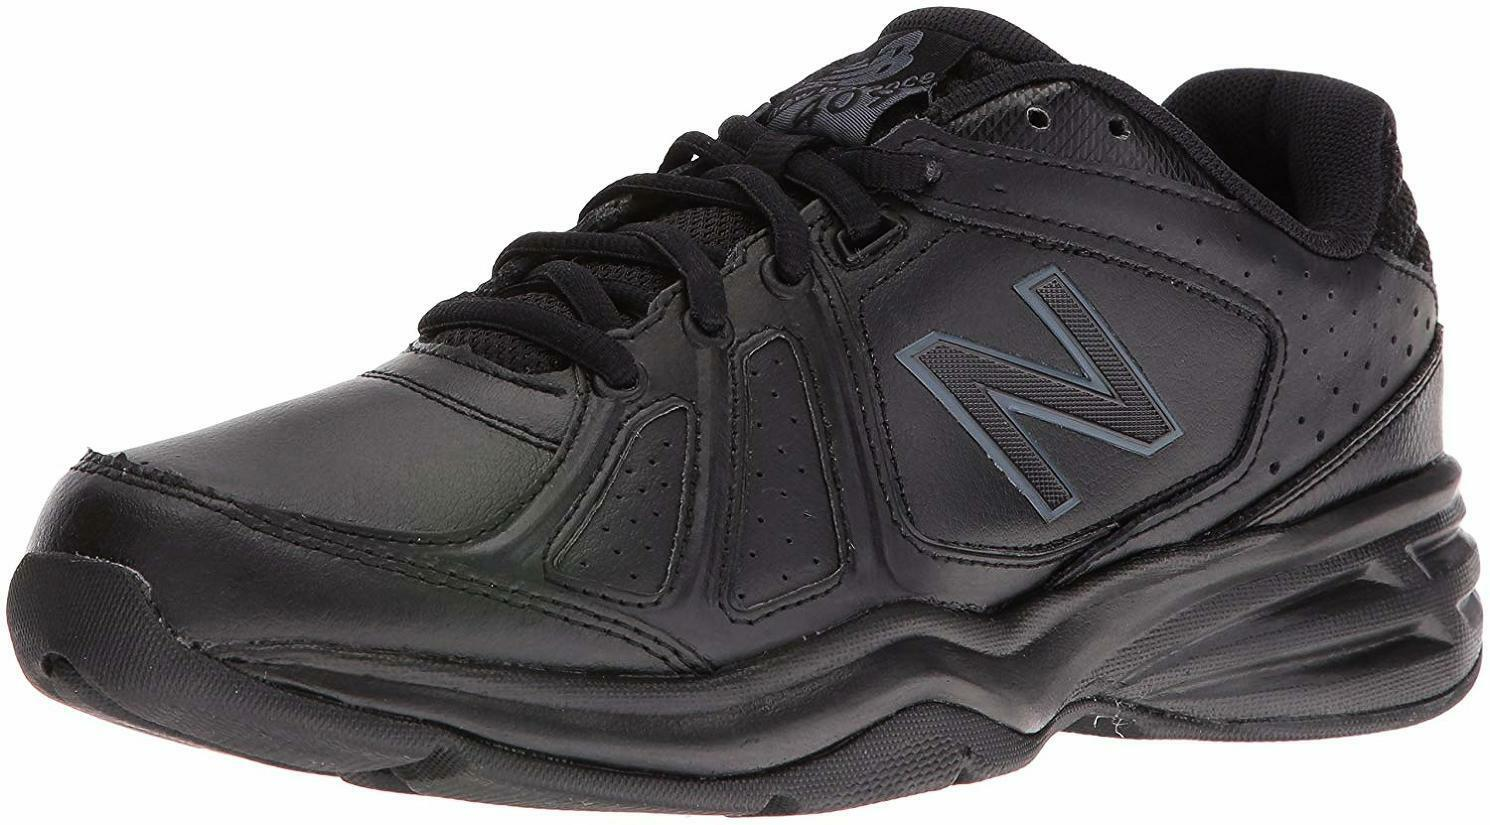 New Balance Para hombre mx409v3 Casual Comfort Entrenamiento Zapato-elegir talla Color